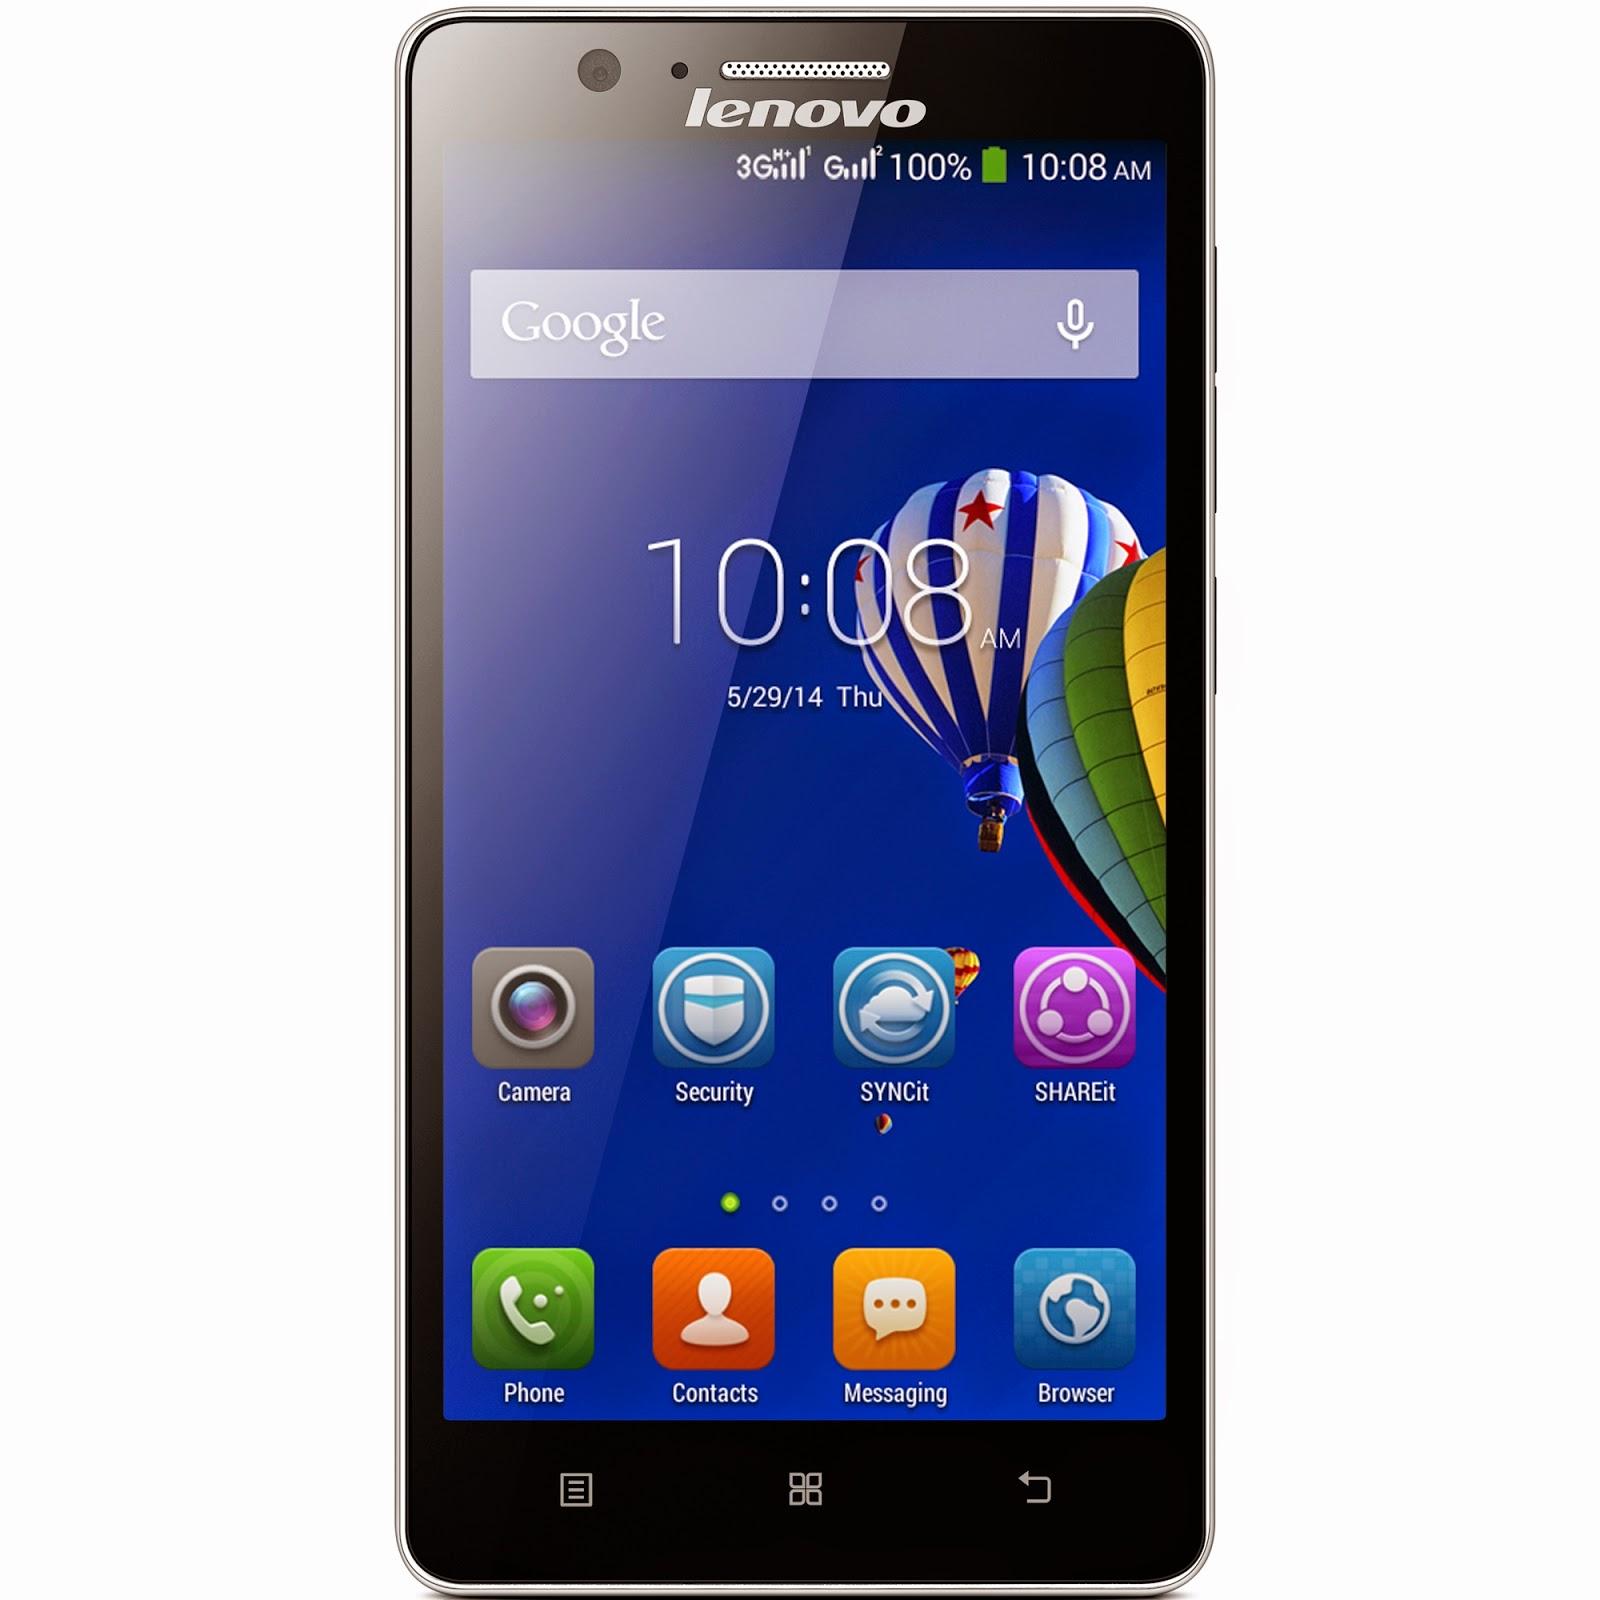 Lenovo A536, Smartphone Lenovo Dengan Android Kitkat